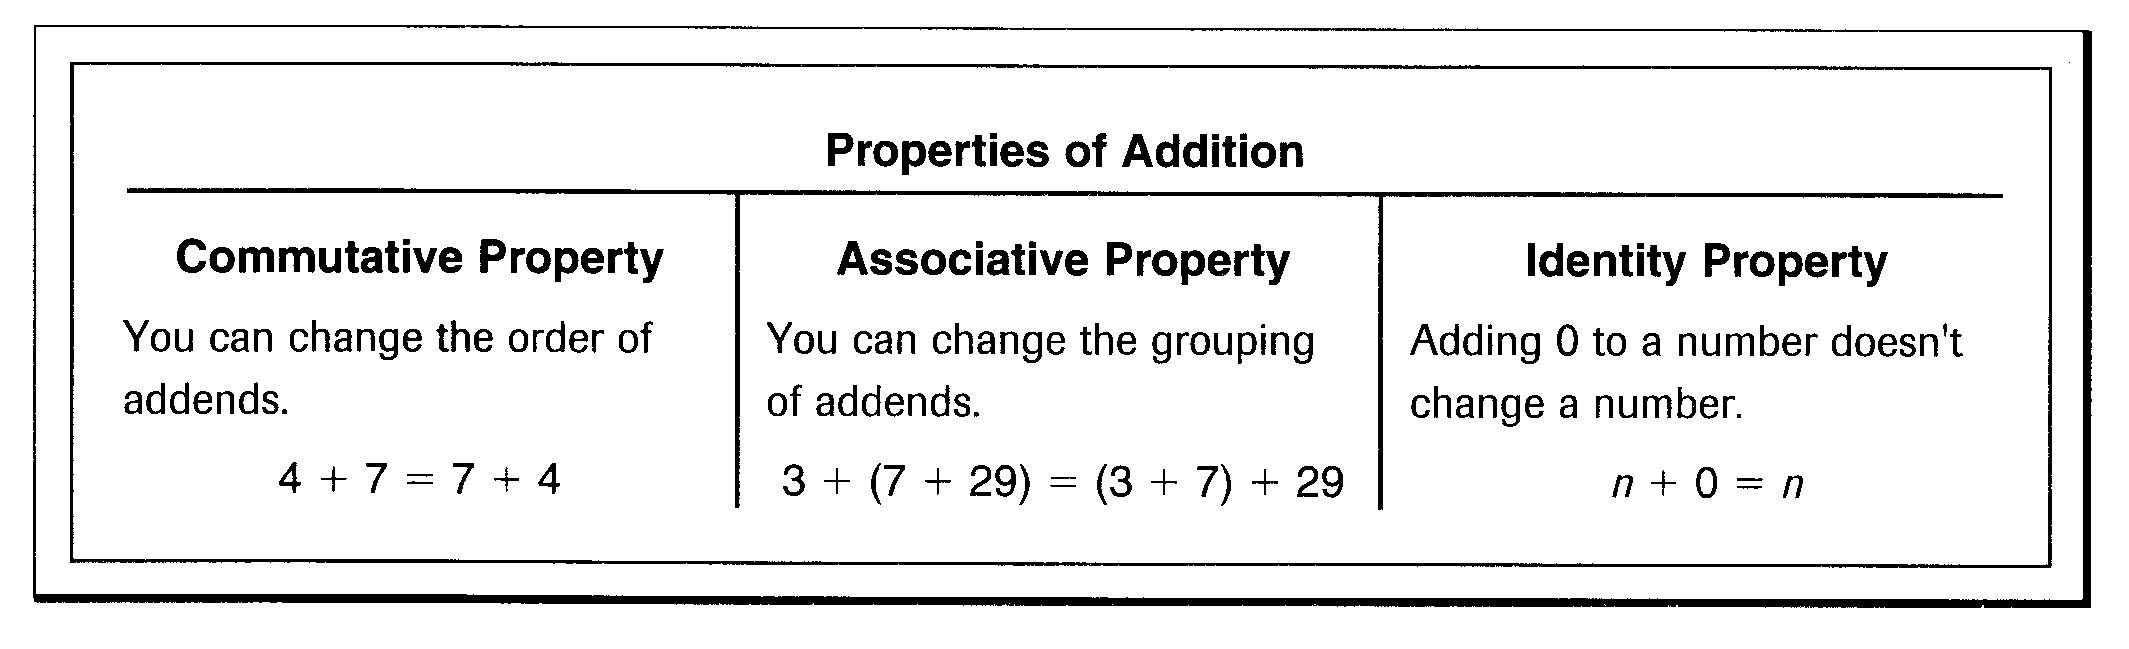 Wallis Robert Math Help Associative Property Commutative Properties Of Addition Commutative property of addition and